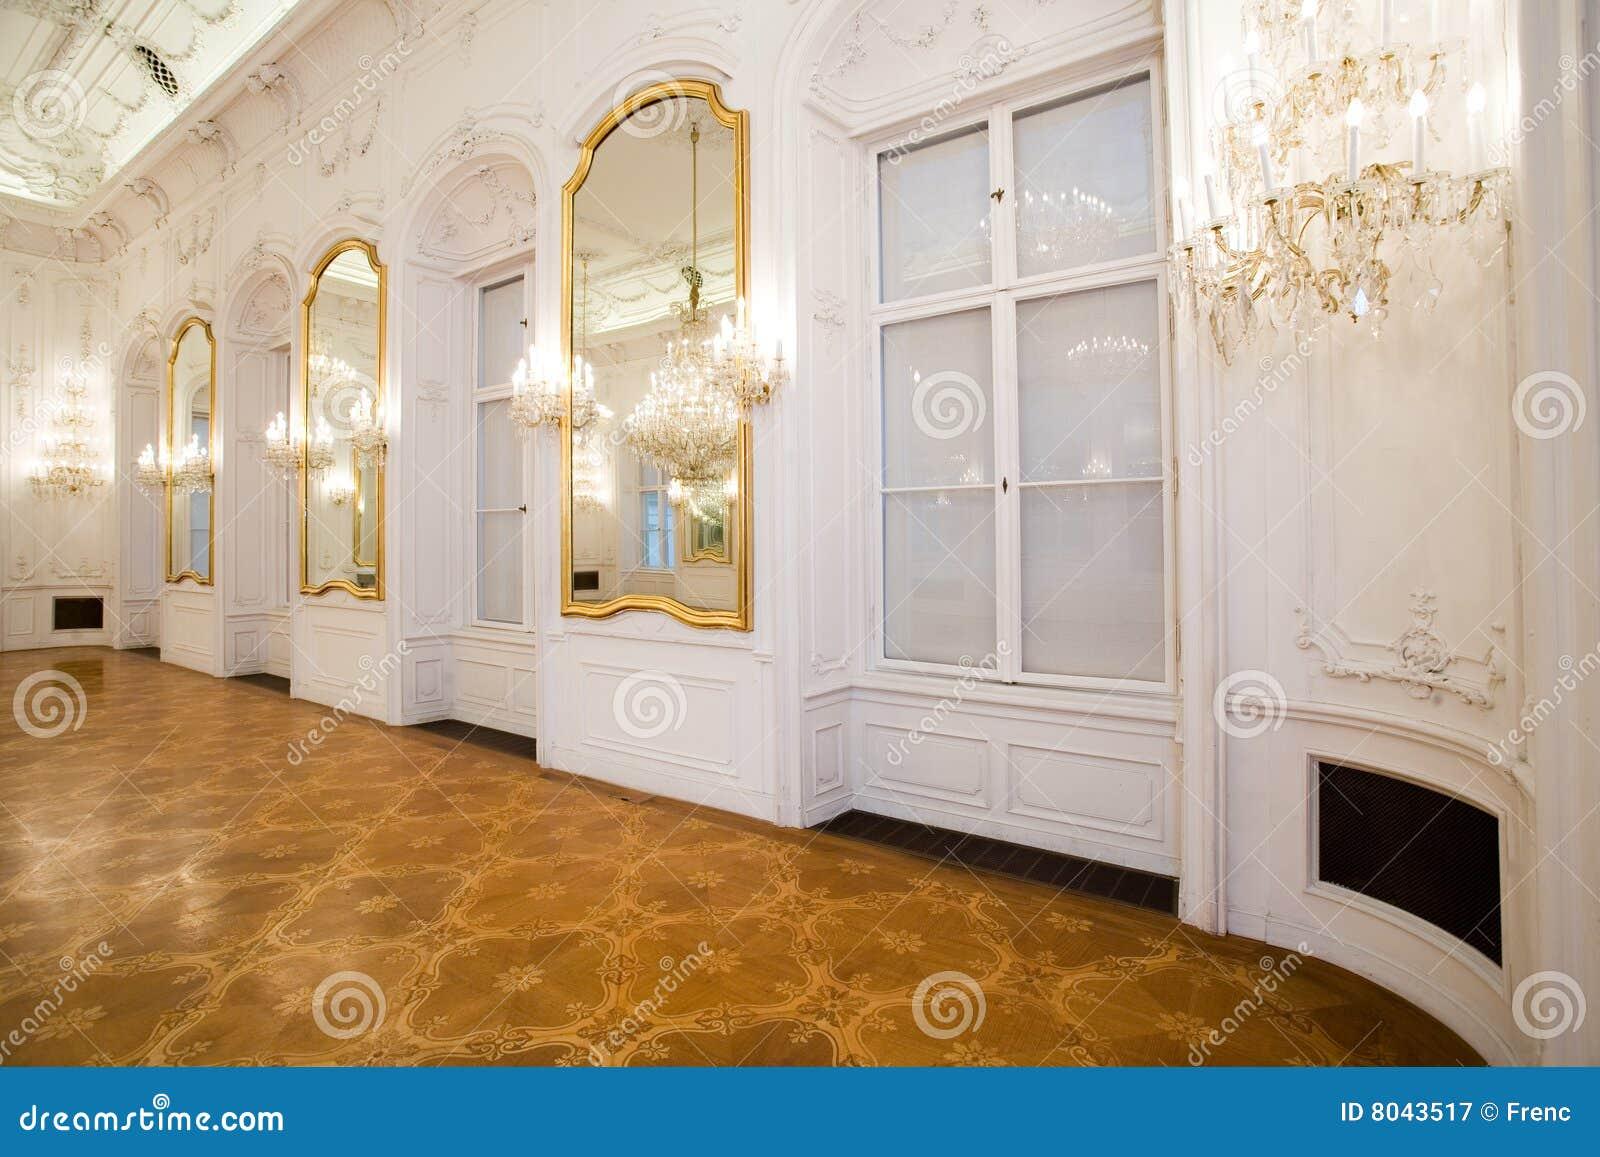 castle interior, mirror room royalty free stock photography